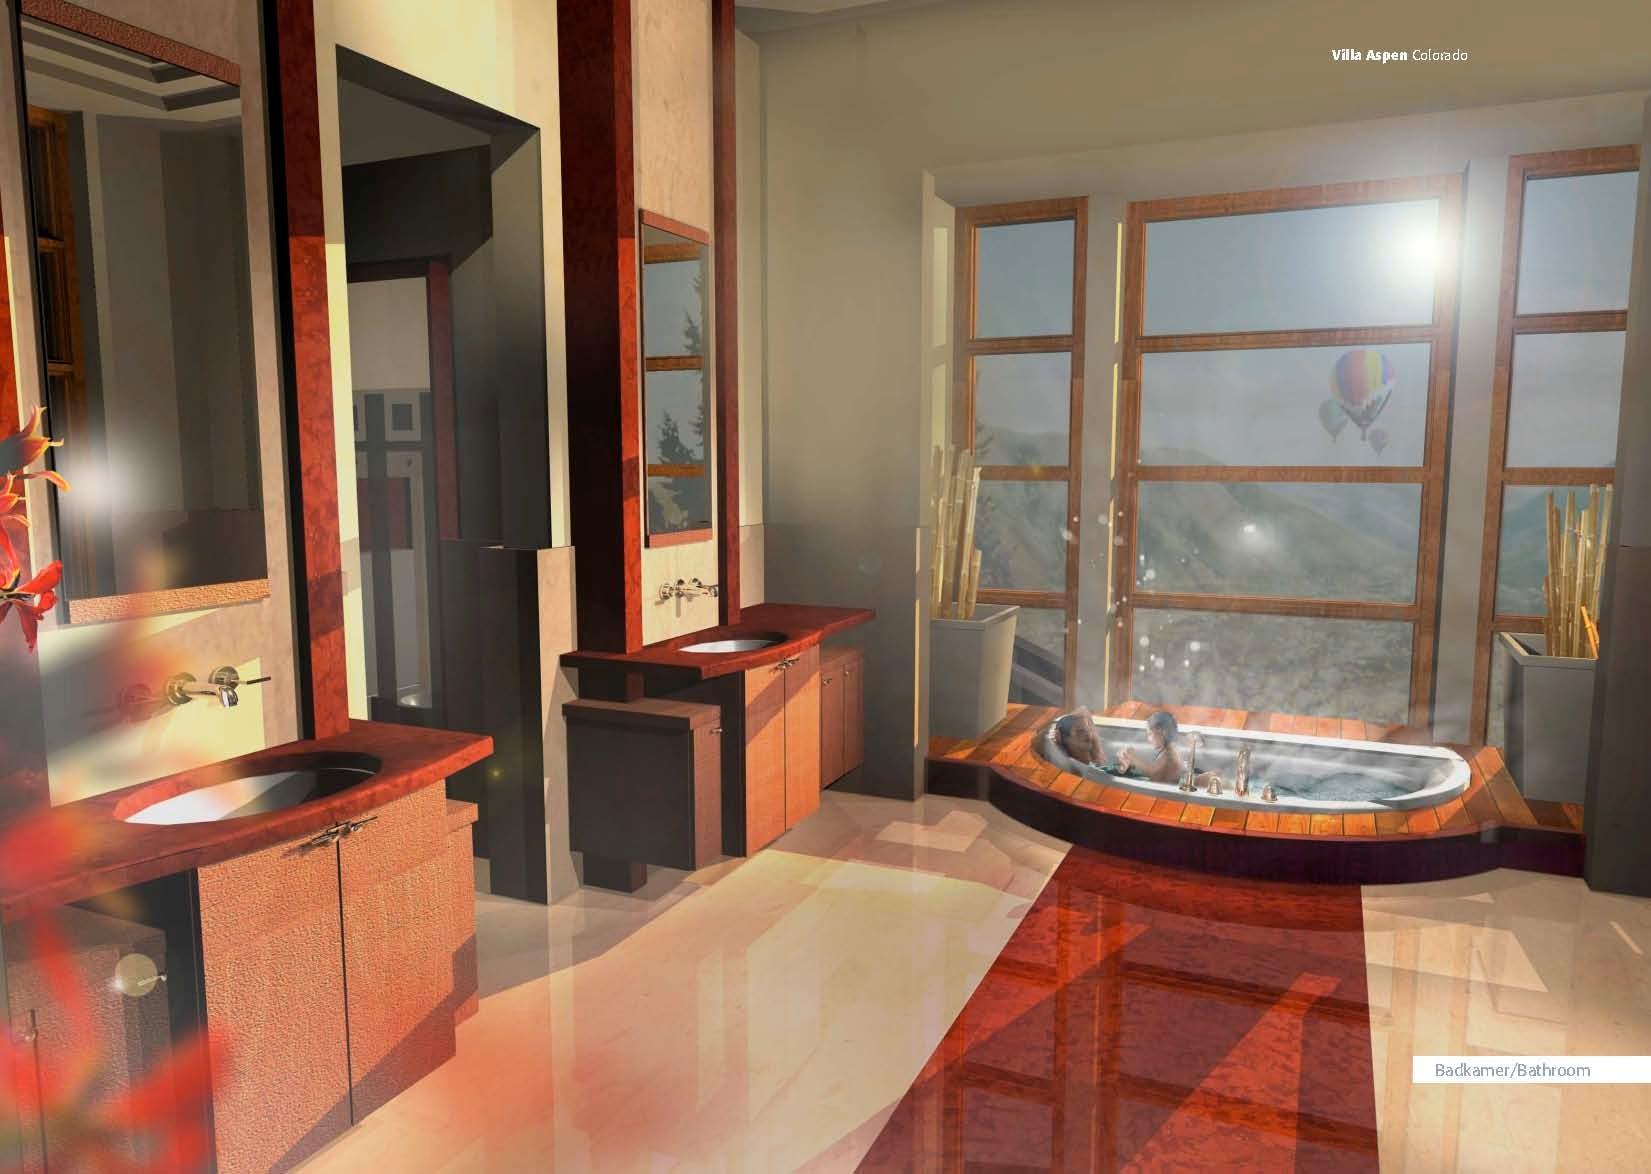 Residential villa Aspen CO | Tudor Slavici | Archinect